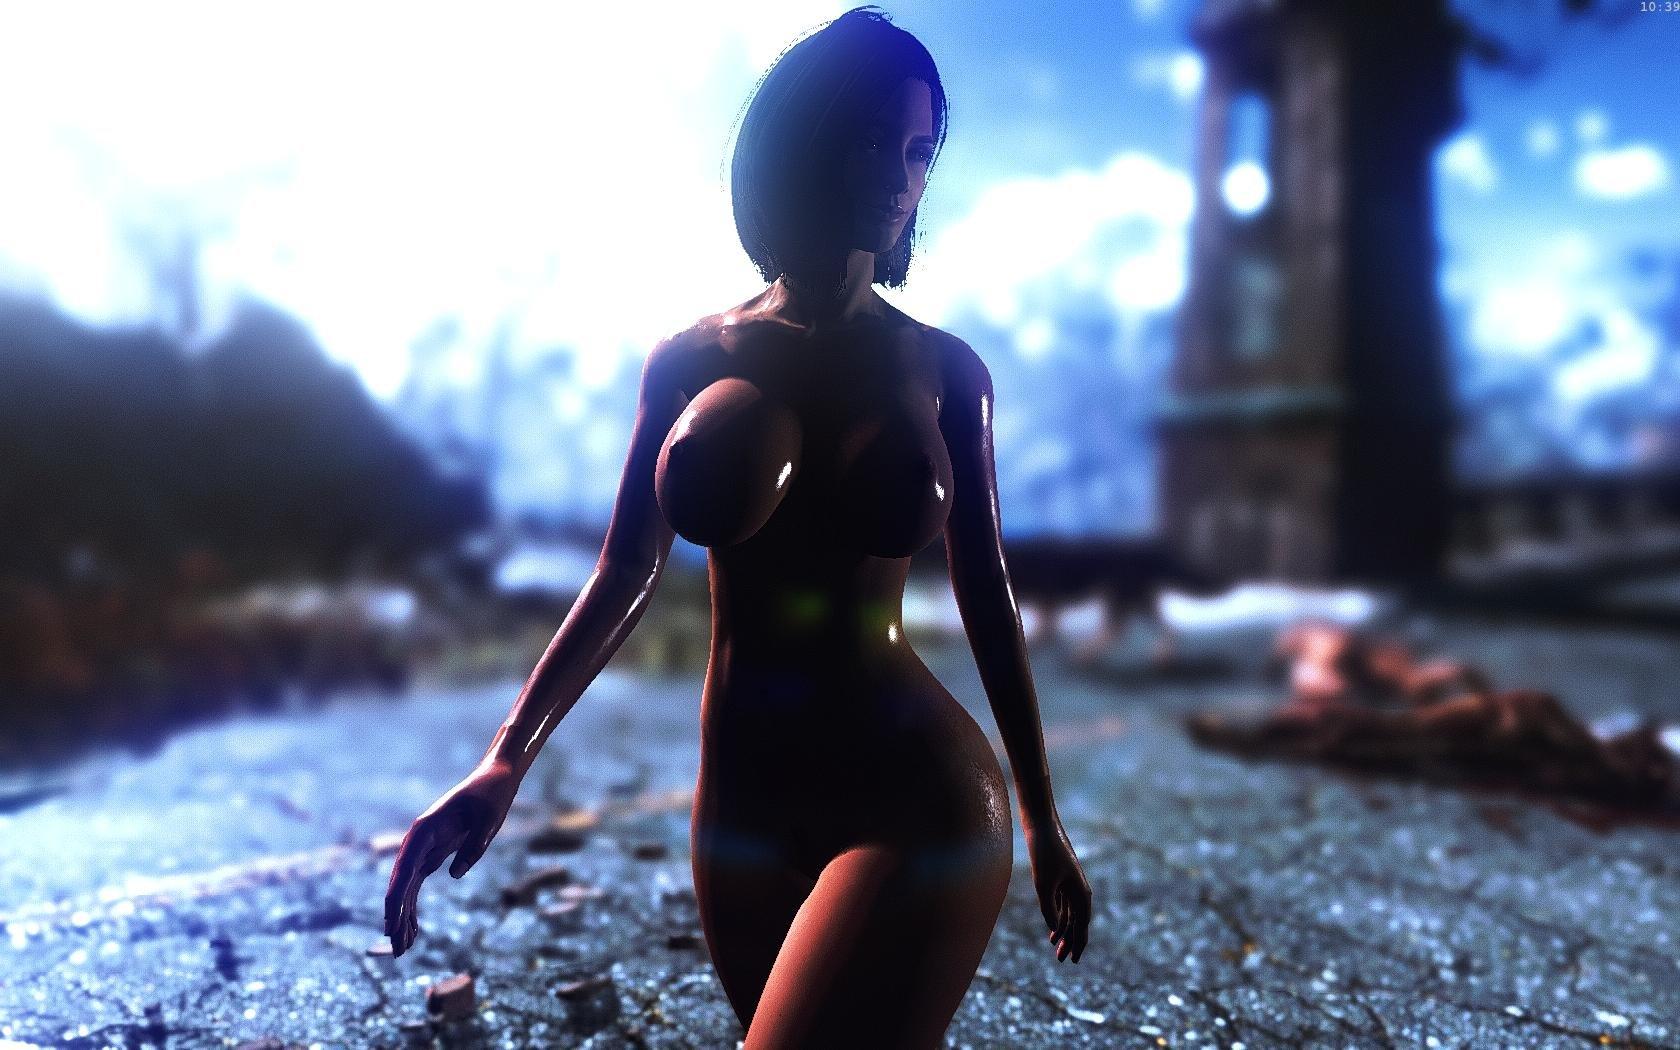 Fallout4 2019-03-10 10-39-23-27